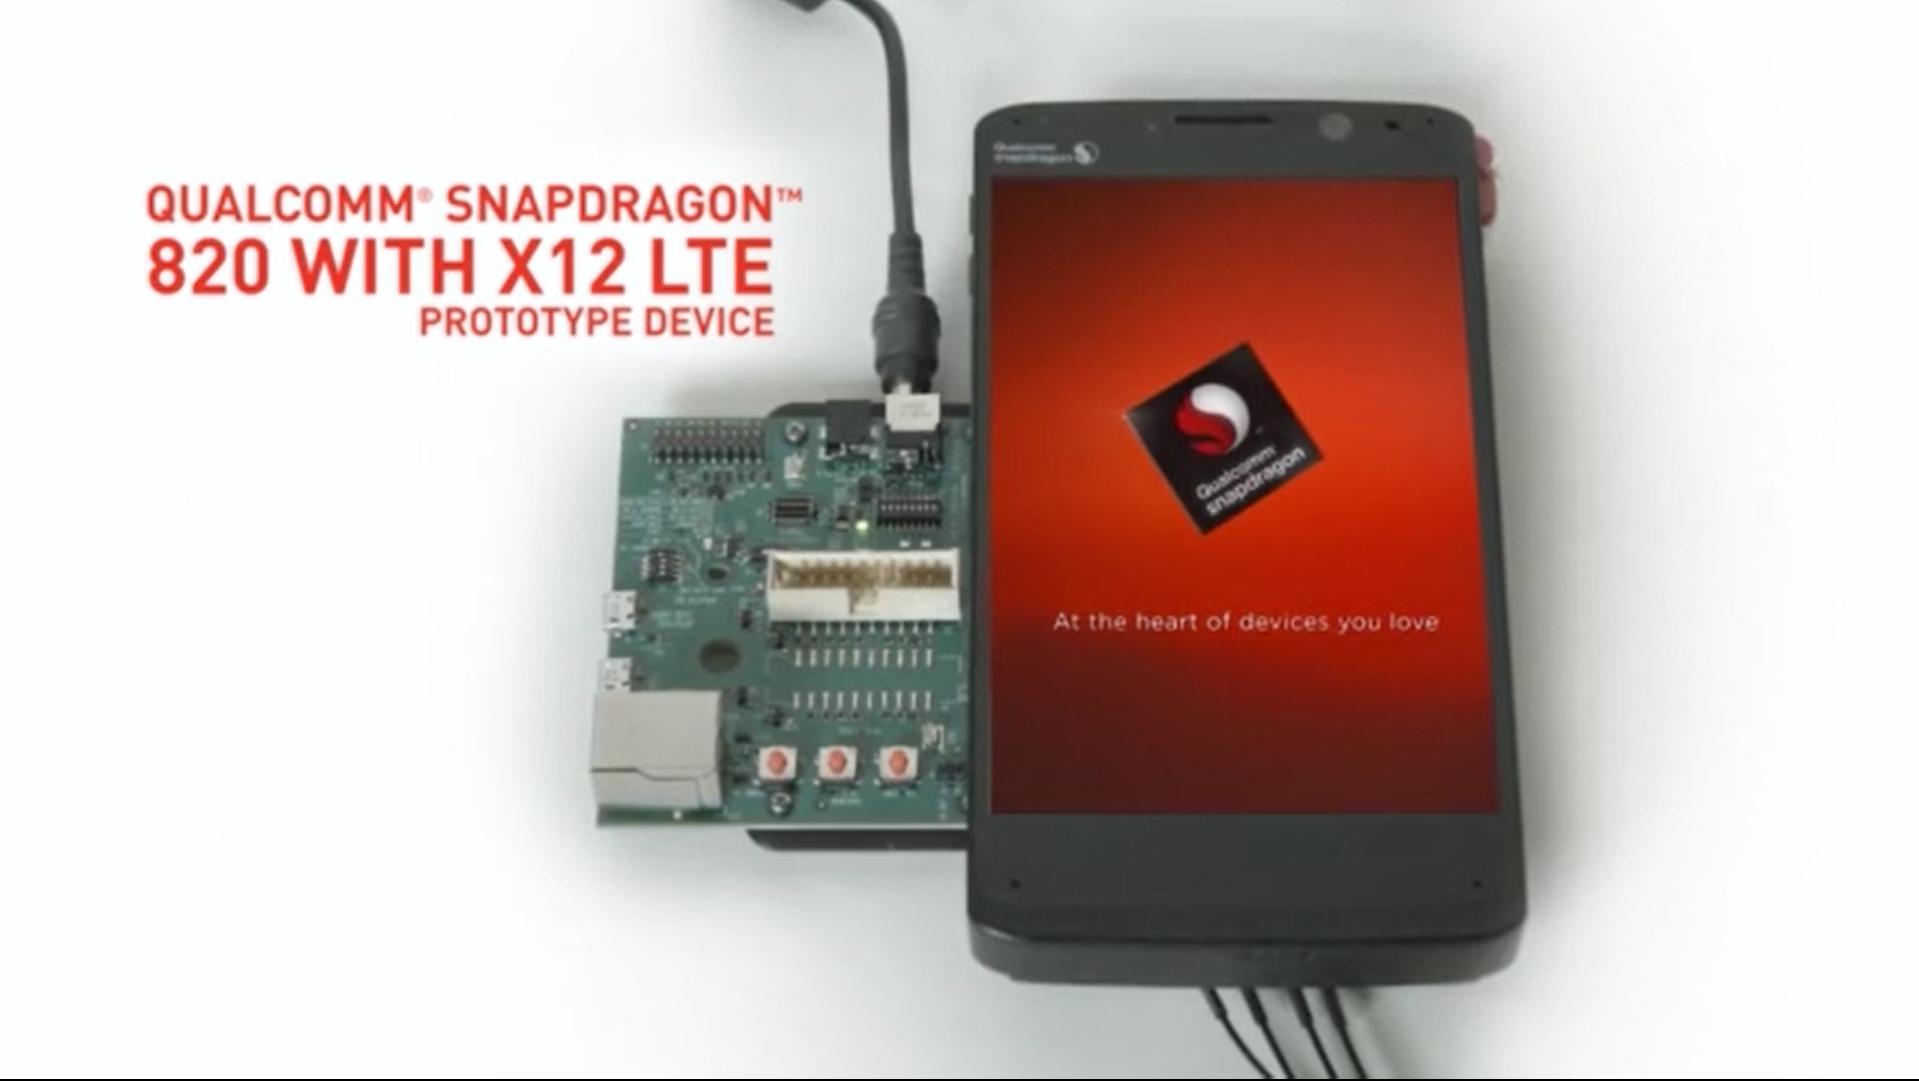 qualcomm-snapdragon-820-prototype-100614563-orig.png